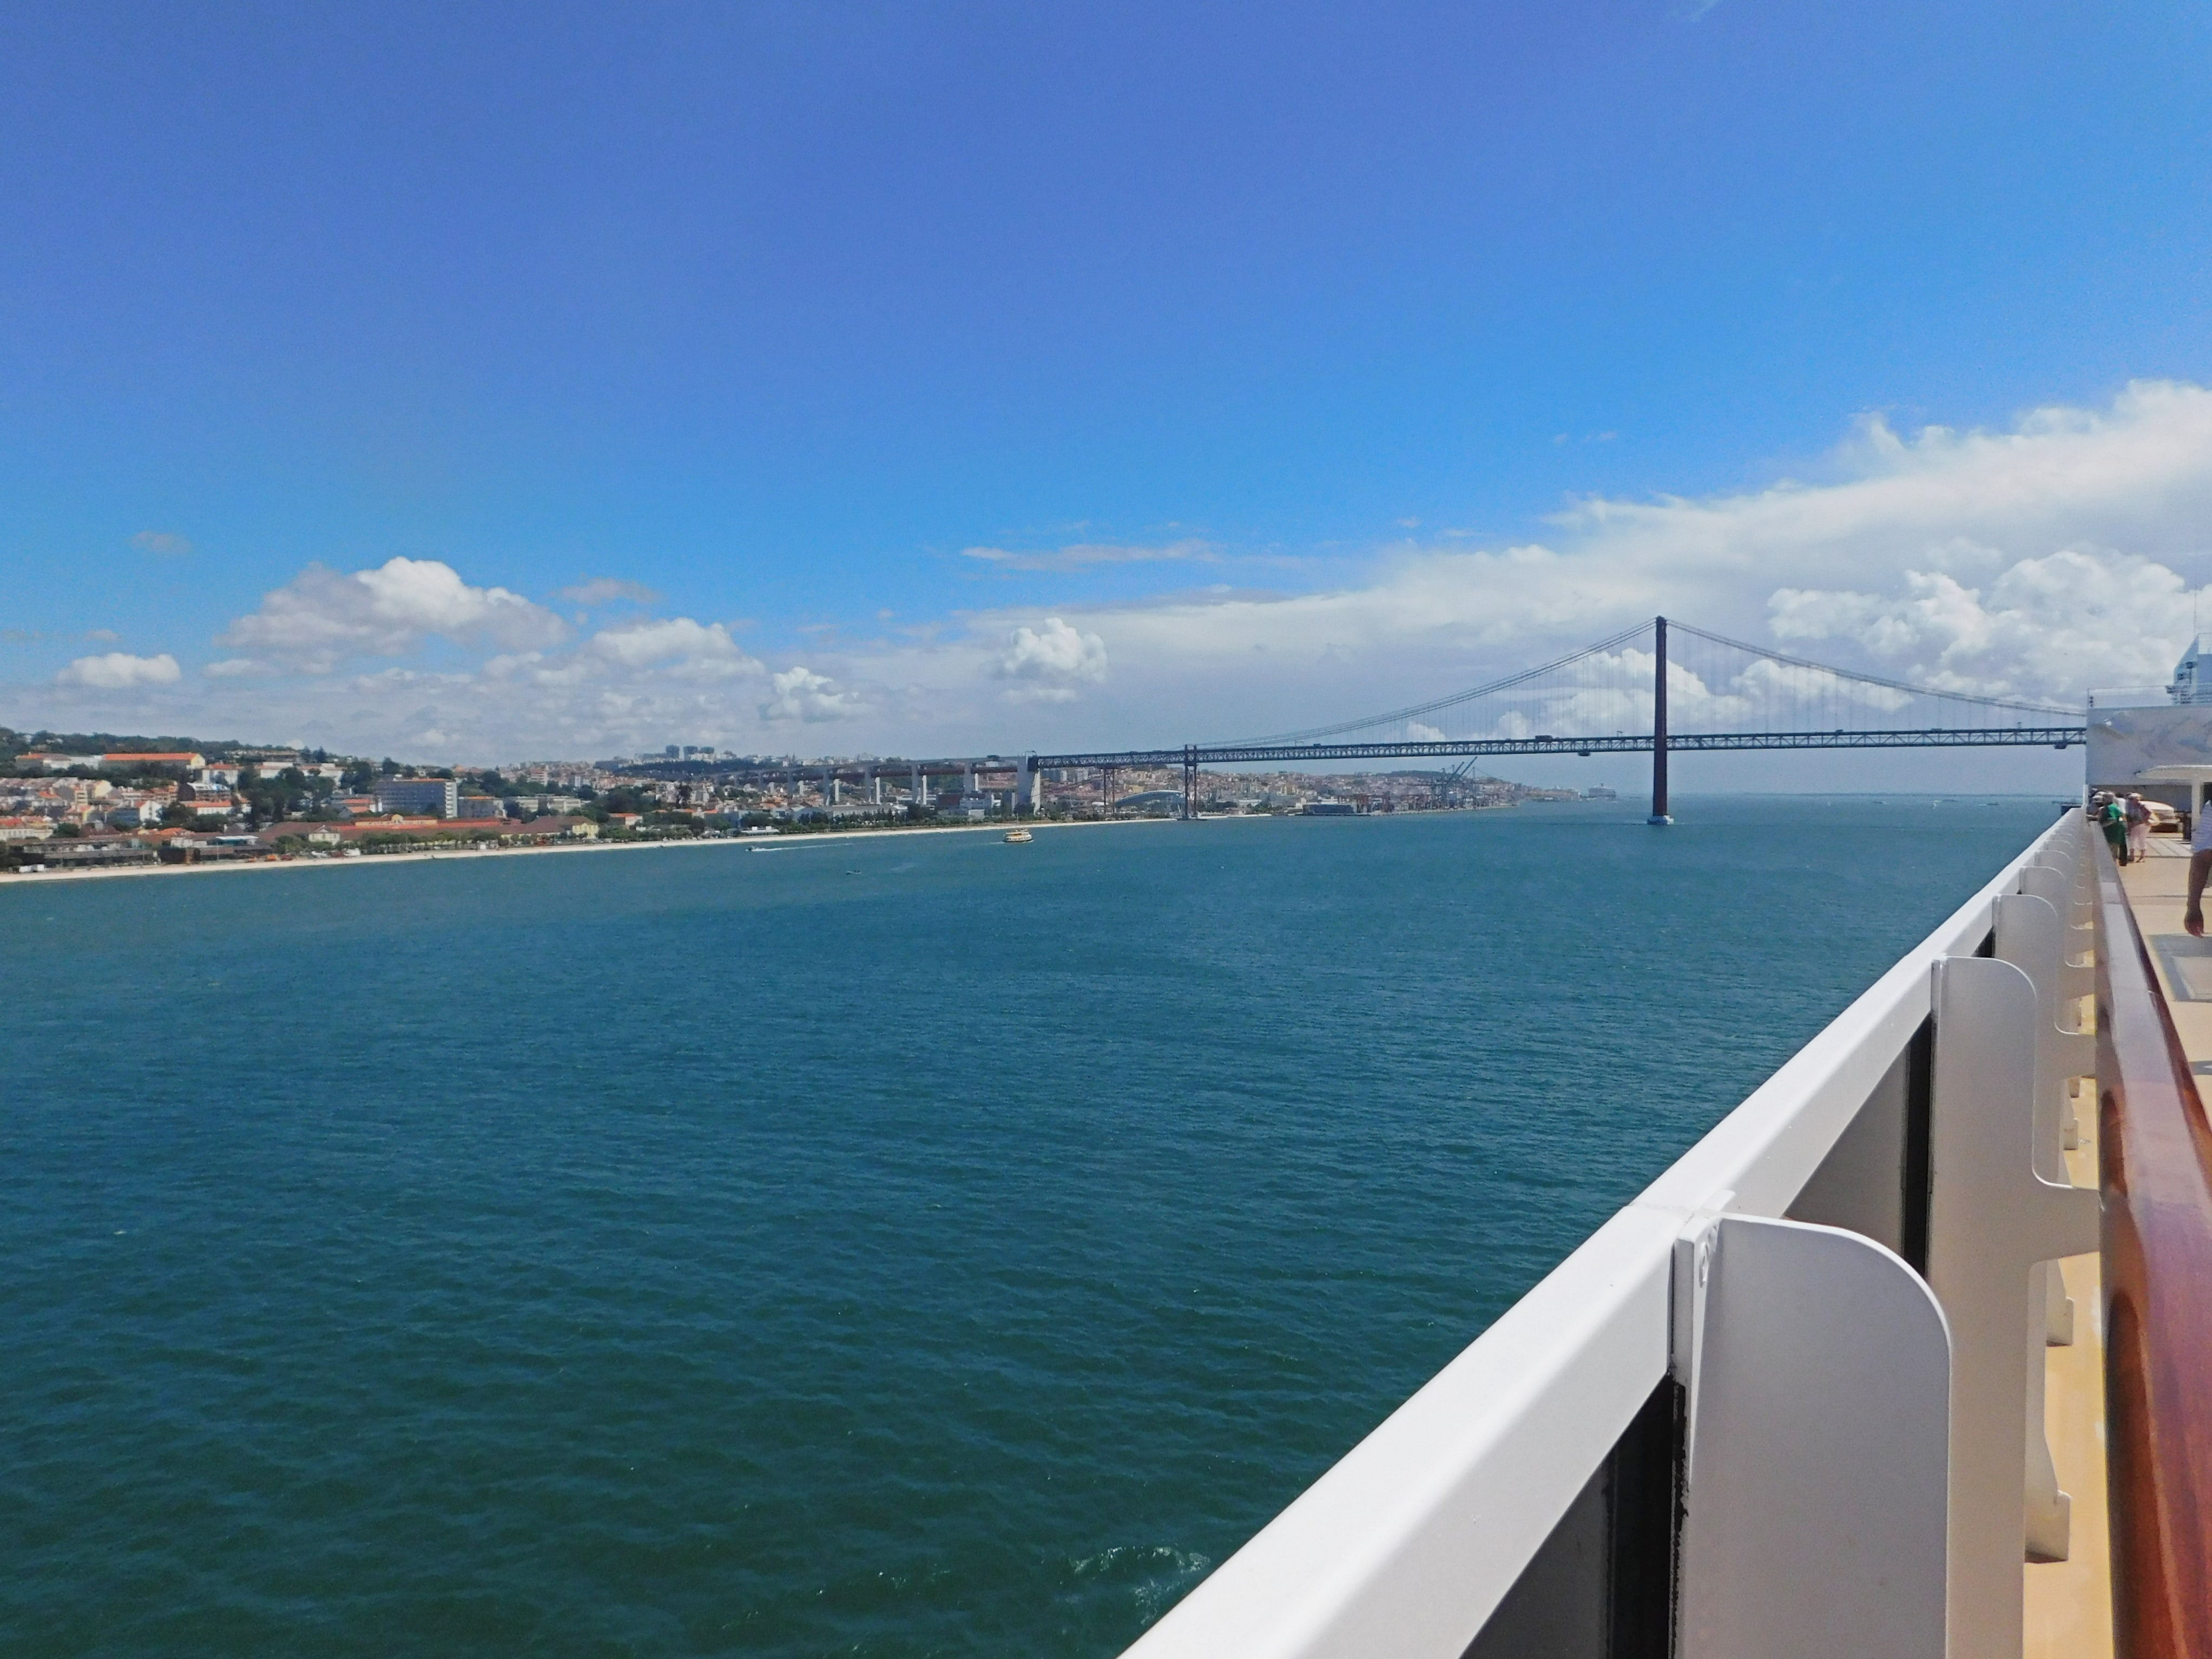 Lissabon Einfahrt